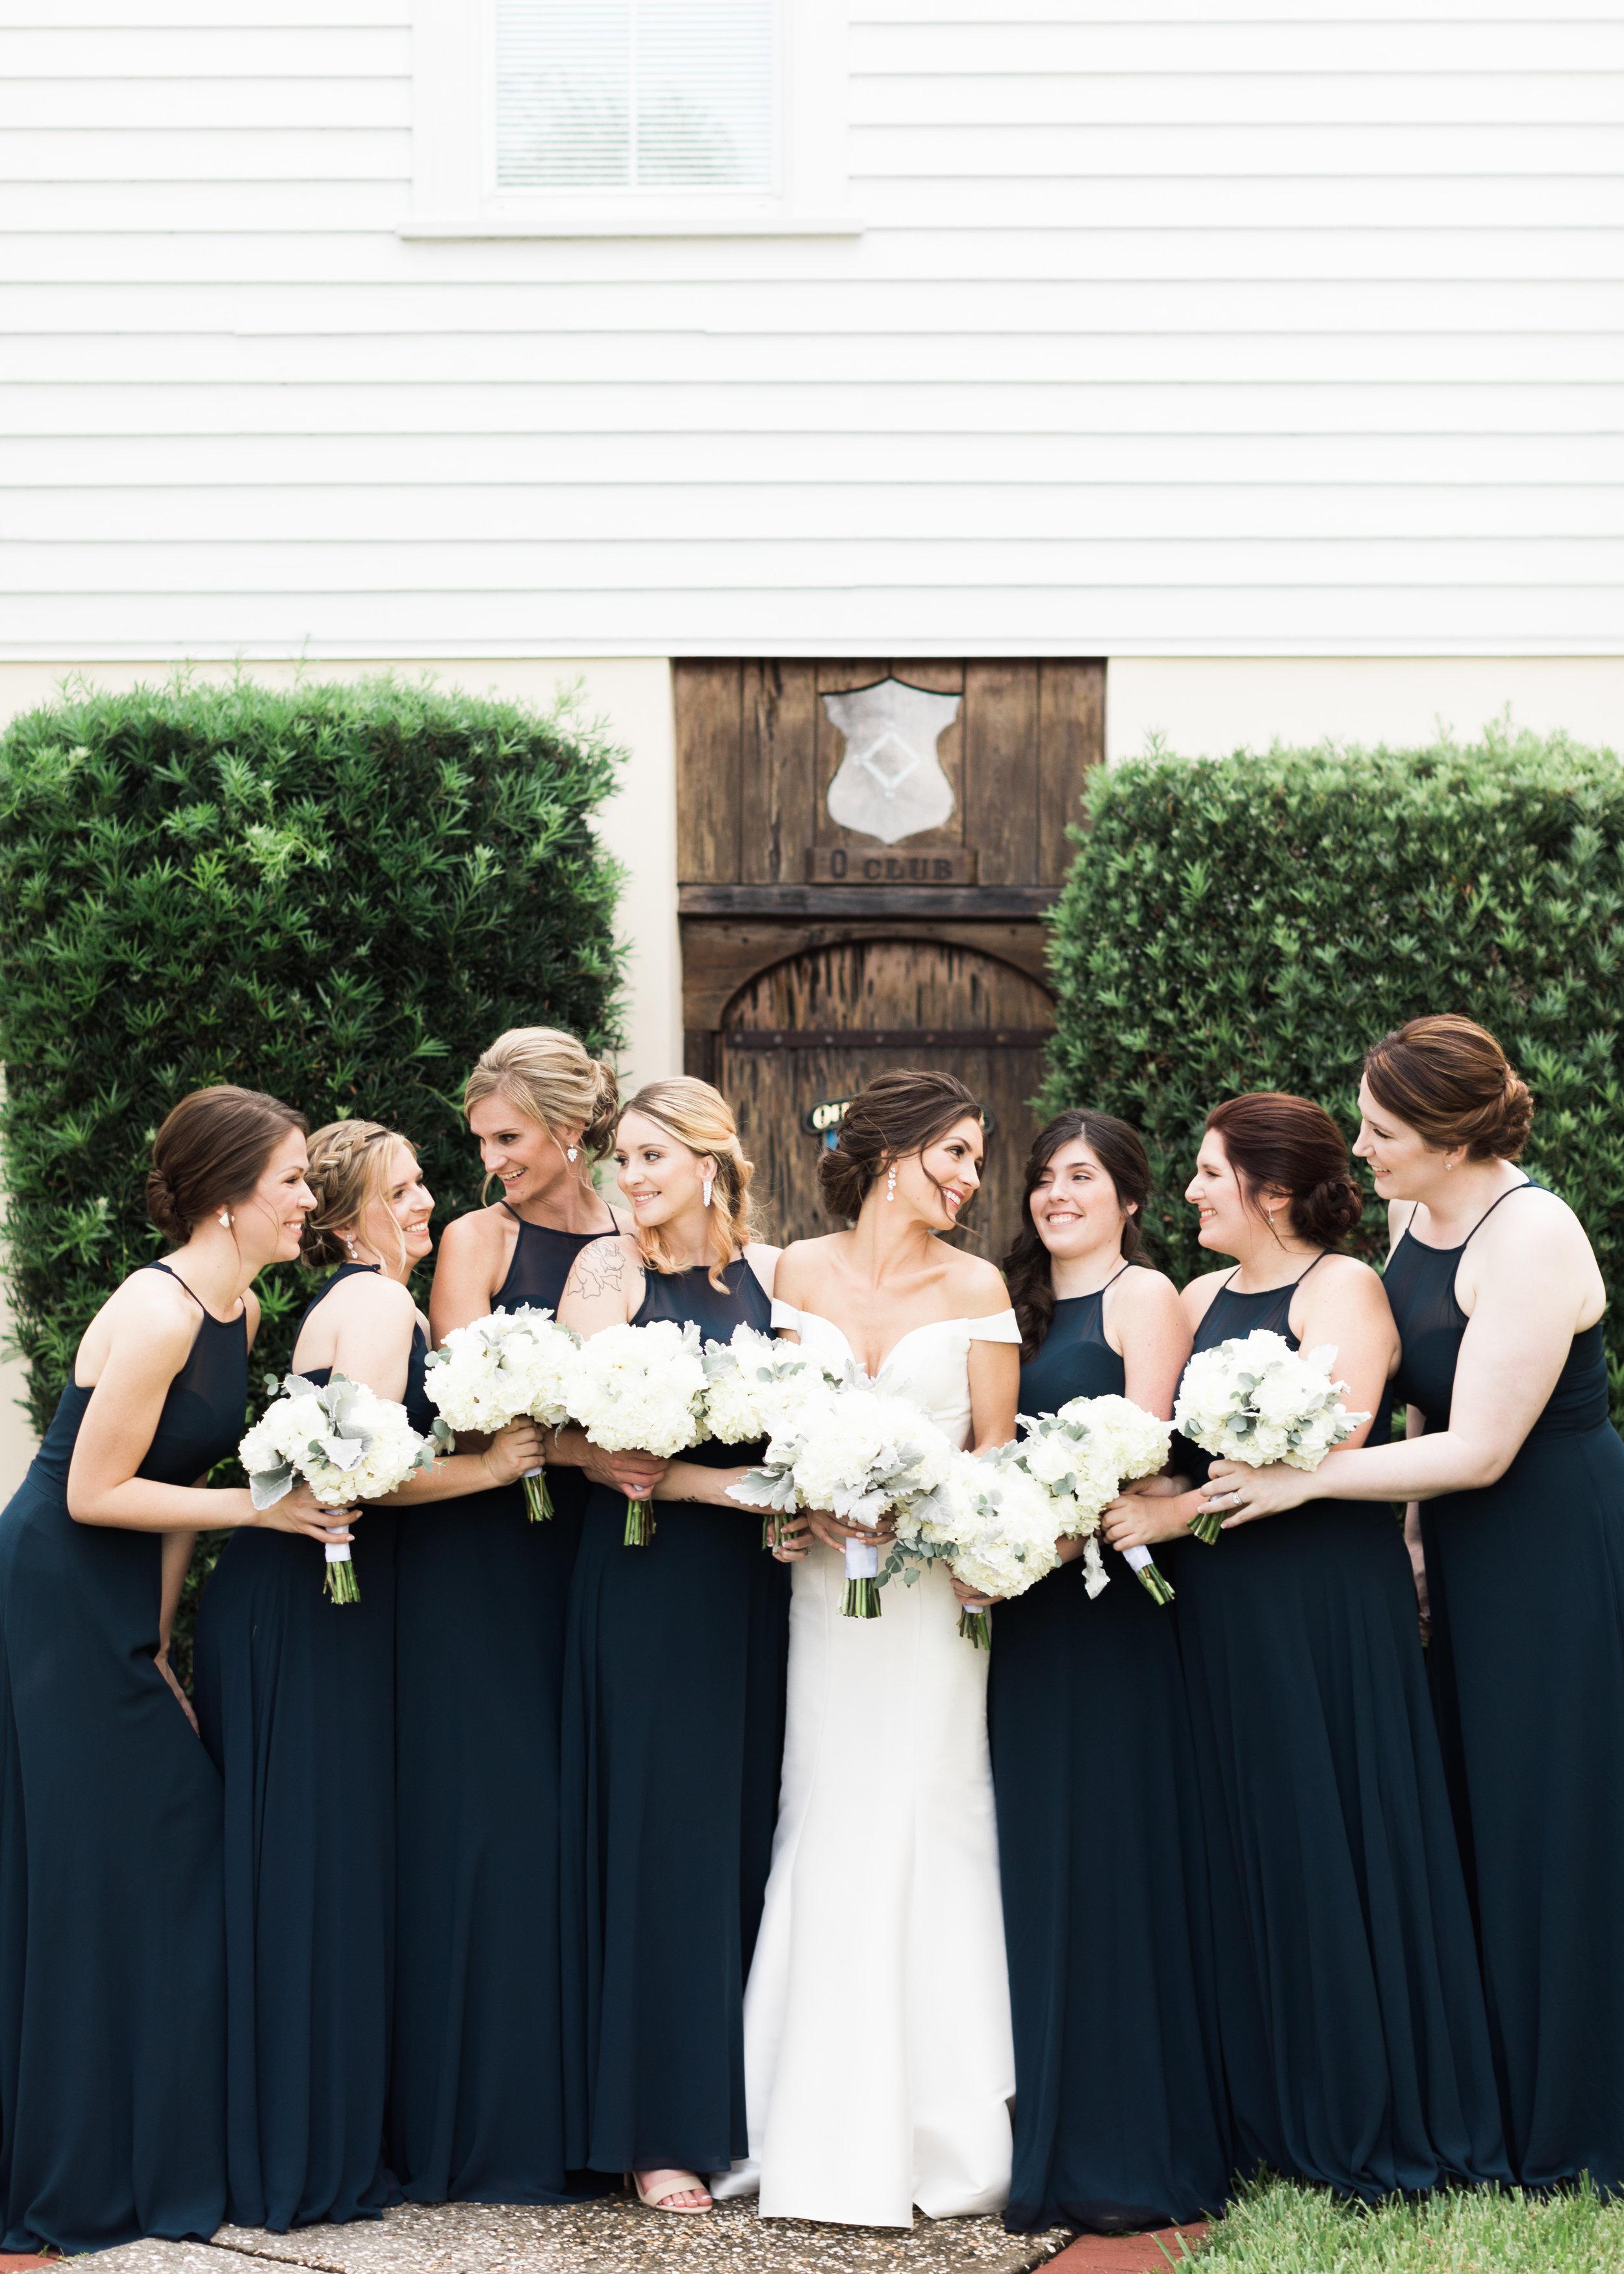 Taylor_TJ_St_Augustine_Treasury_on_the_Plaza_Wedding_Photography__0010_-10.jpg